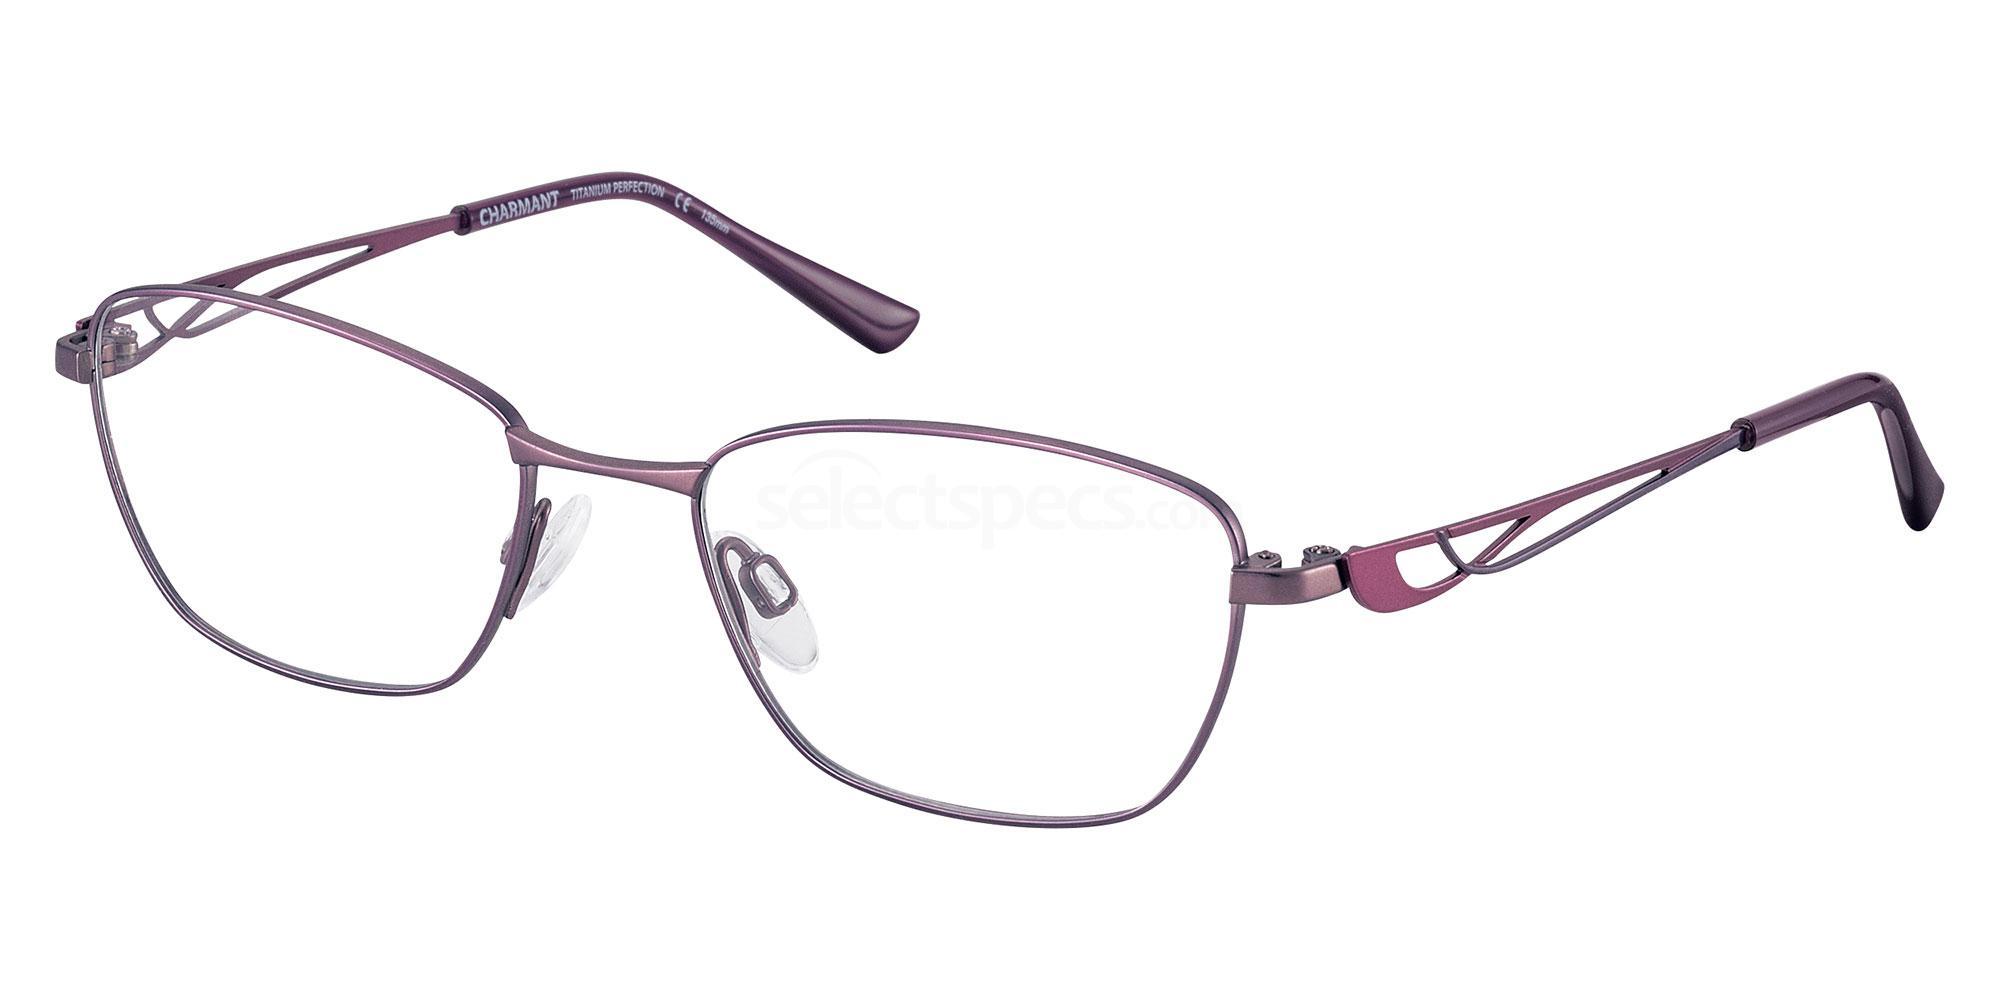 PU CH12149 Glasses, Charmant Titanium Perfection